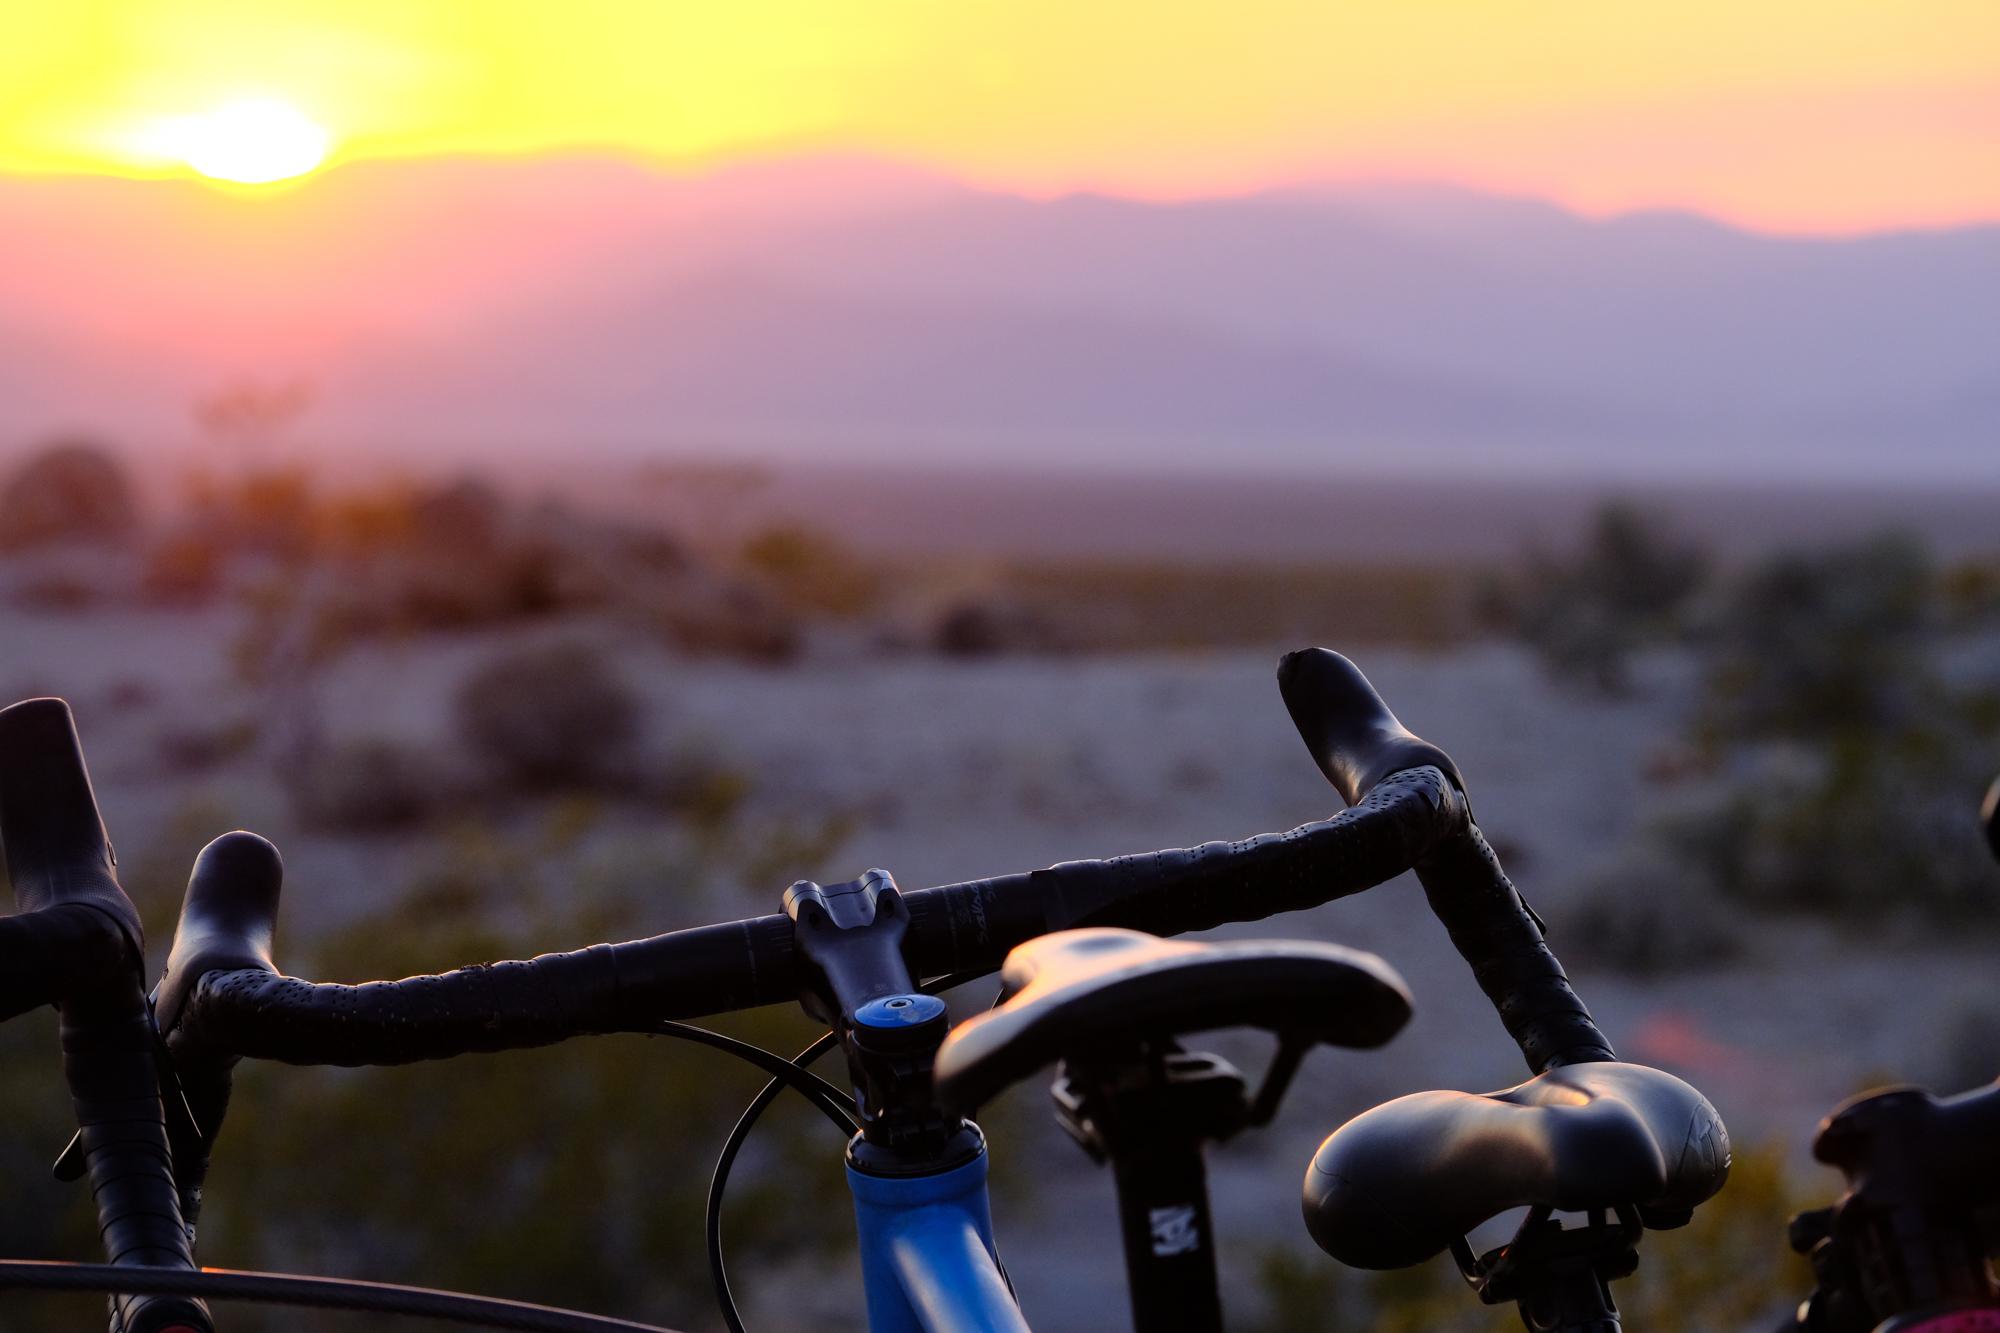 Mojave-3-2.jpg